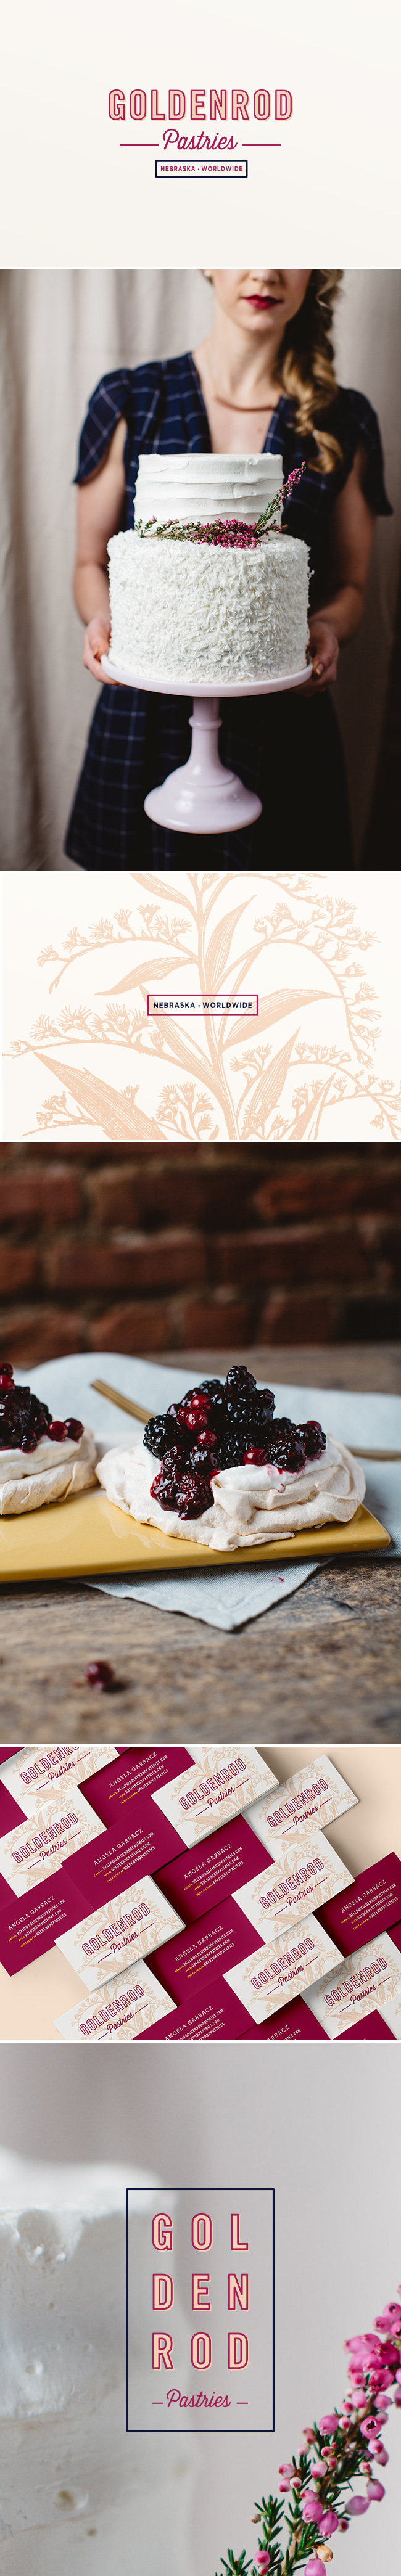 Nubby Twiglet | Goldenrod Pastries